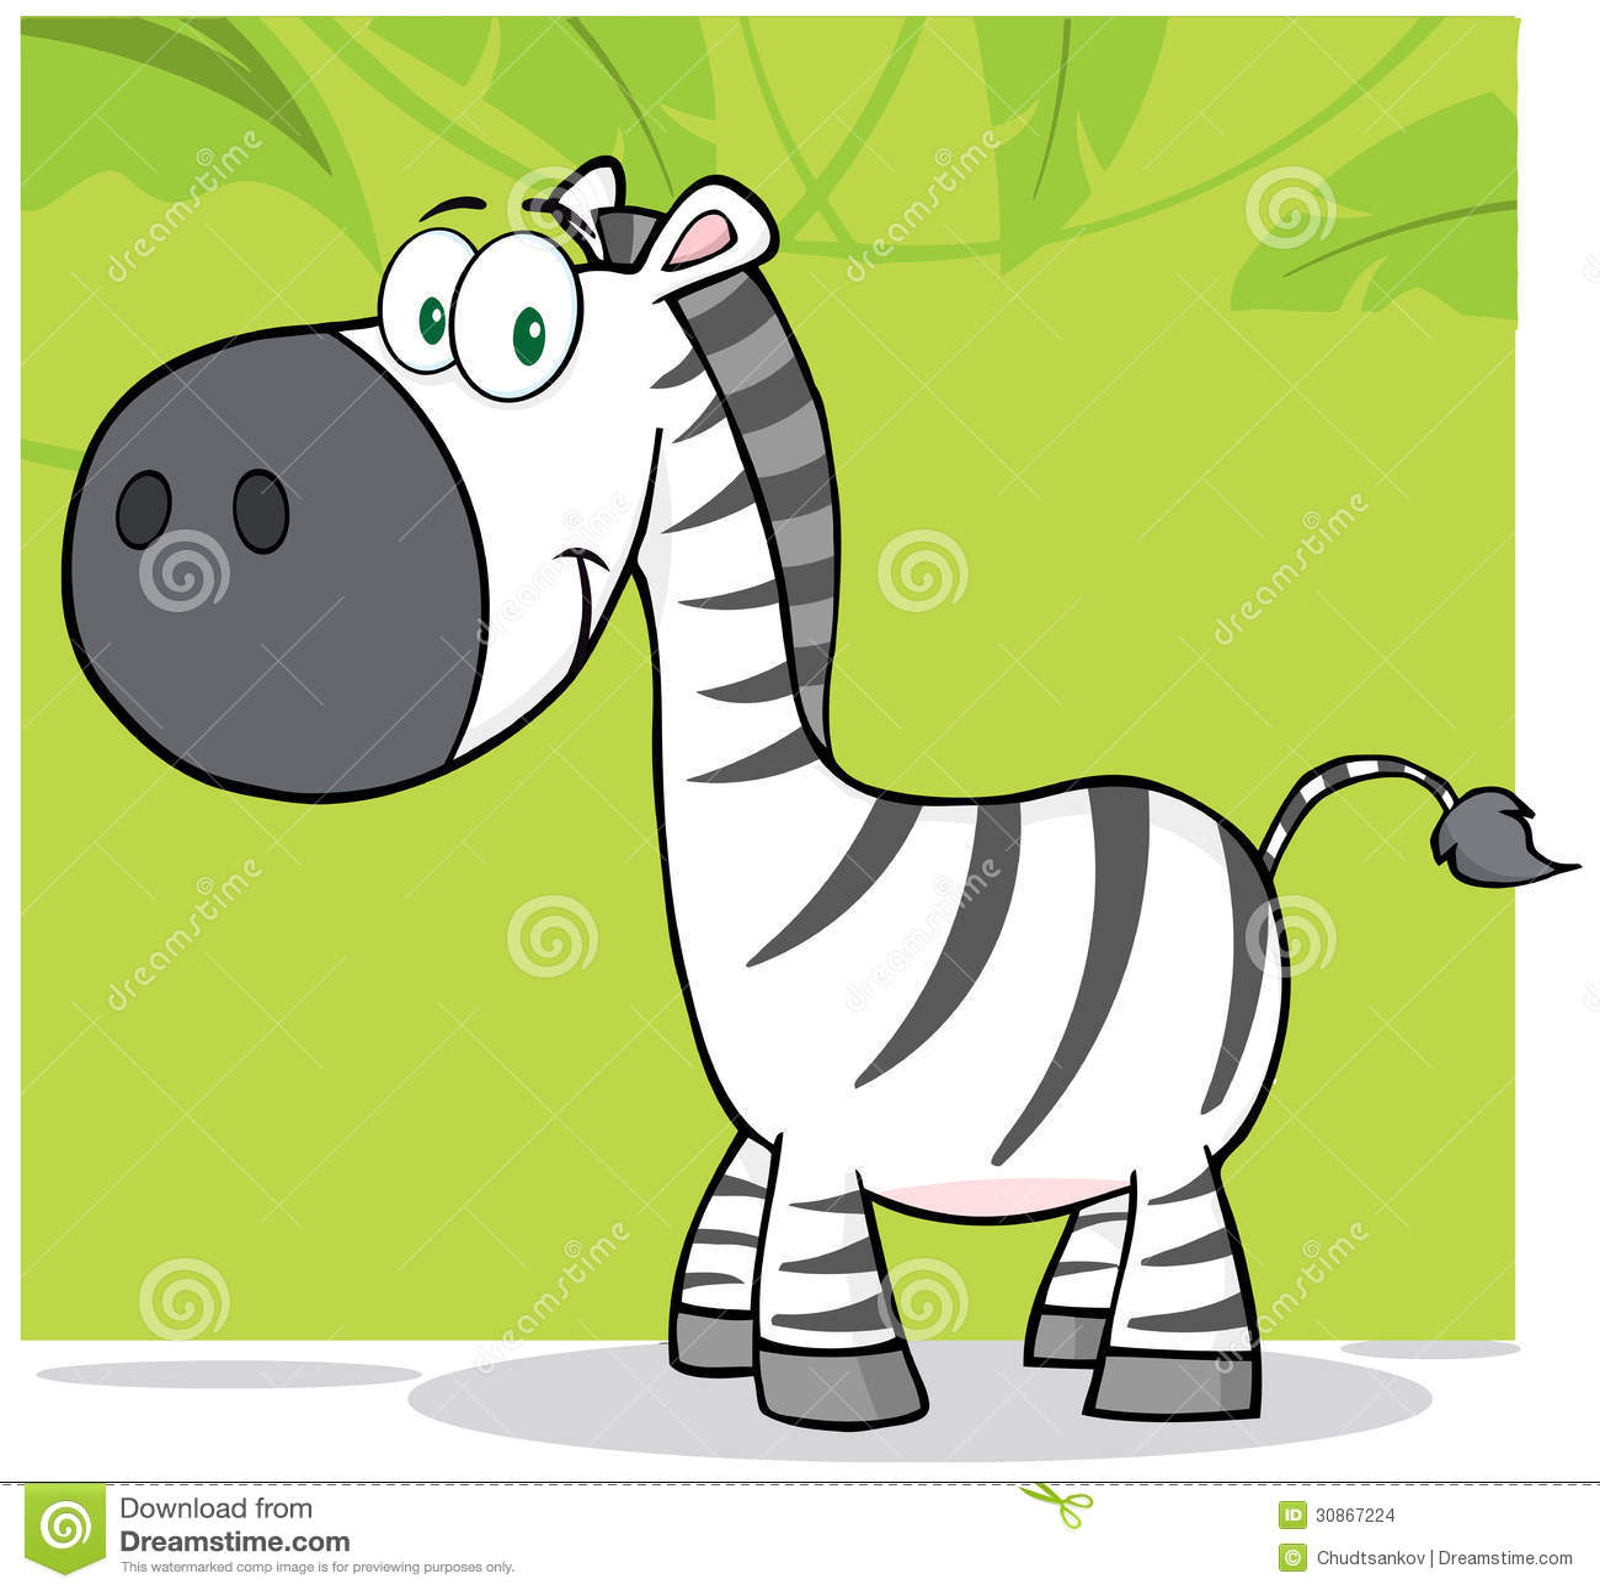 Cartoon Characters Zebra : Smiling zebra cartoon character with background stock